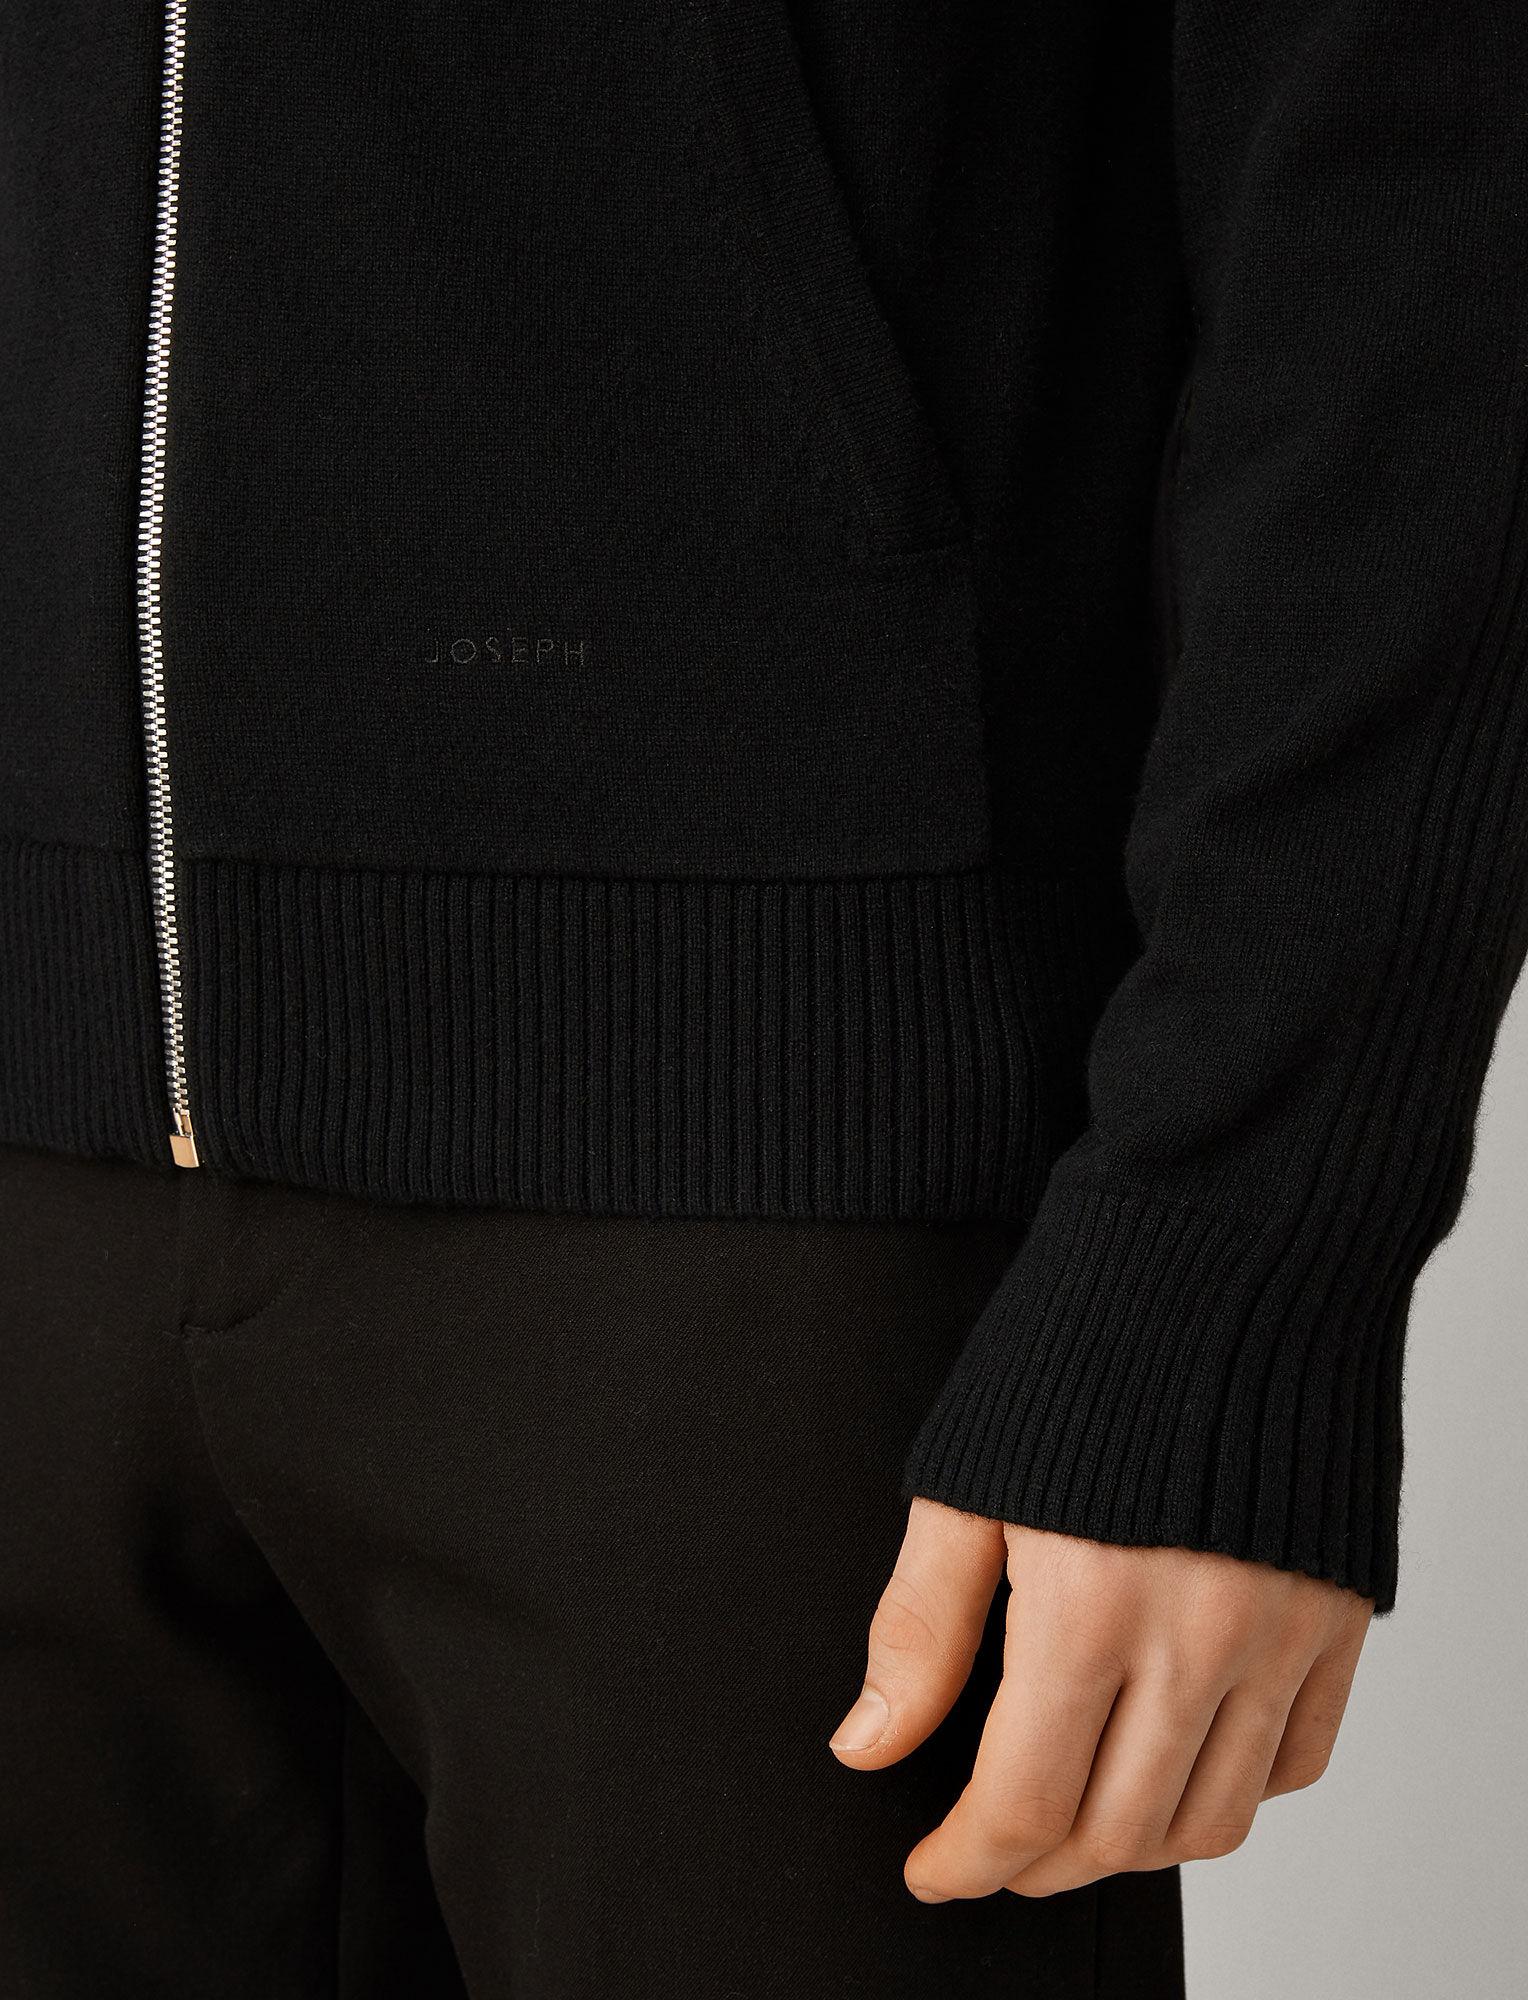 Joseph, Mongolian Cashmere Knit Hoodie, in BLACK